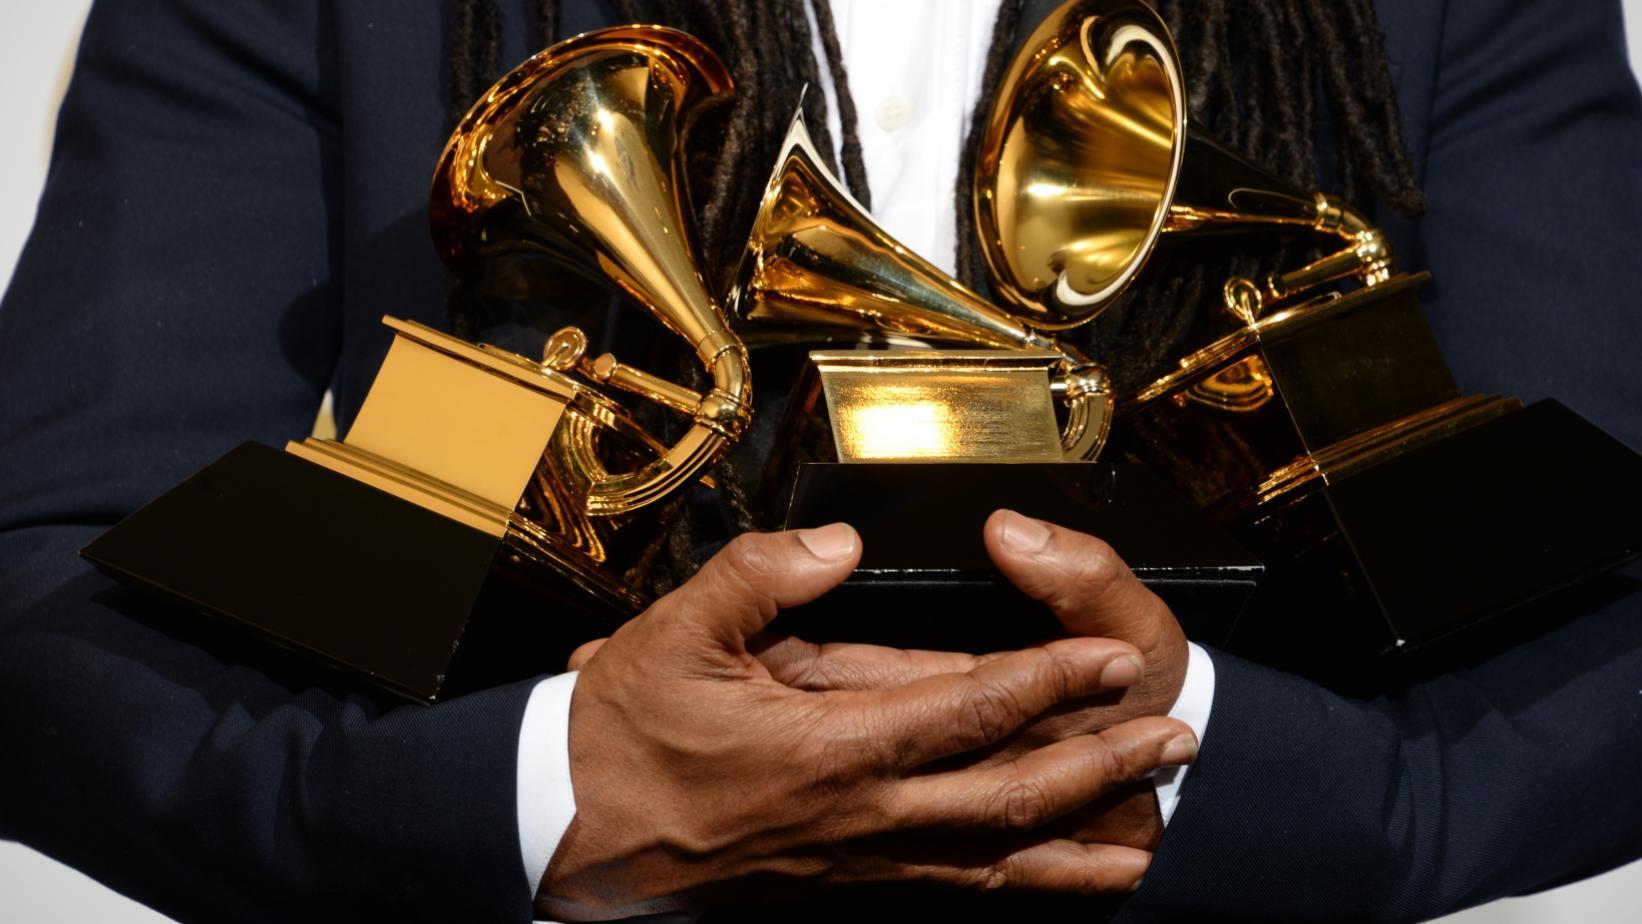 Objavljene nominacije za 63. dodjelu Grammyja